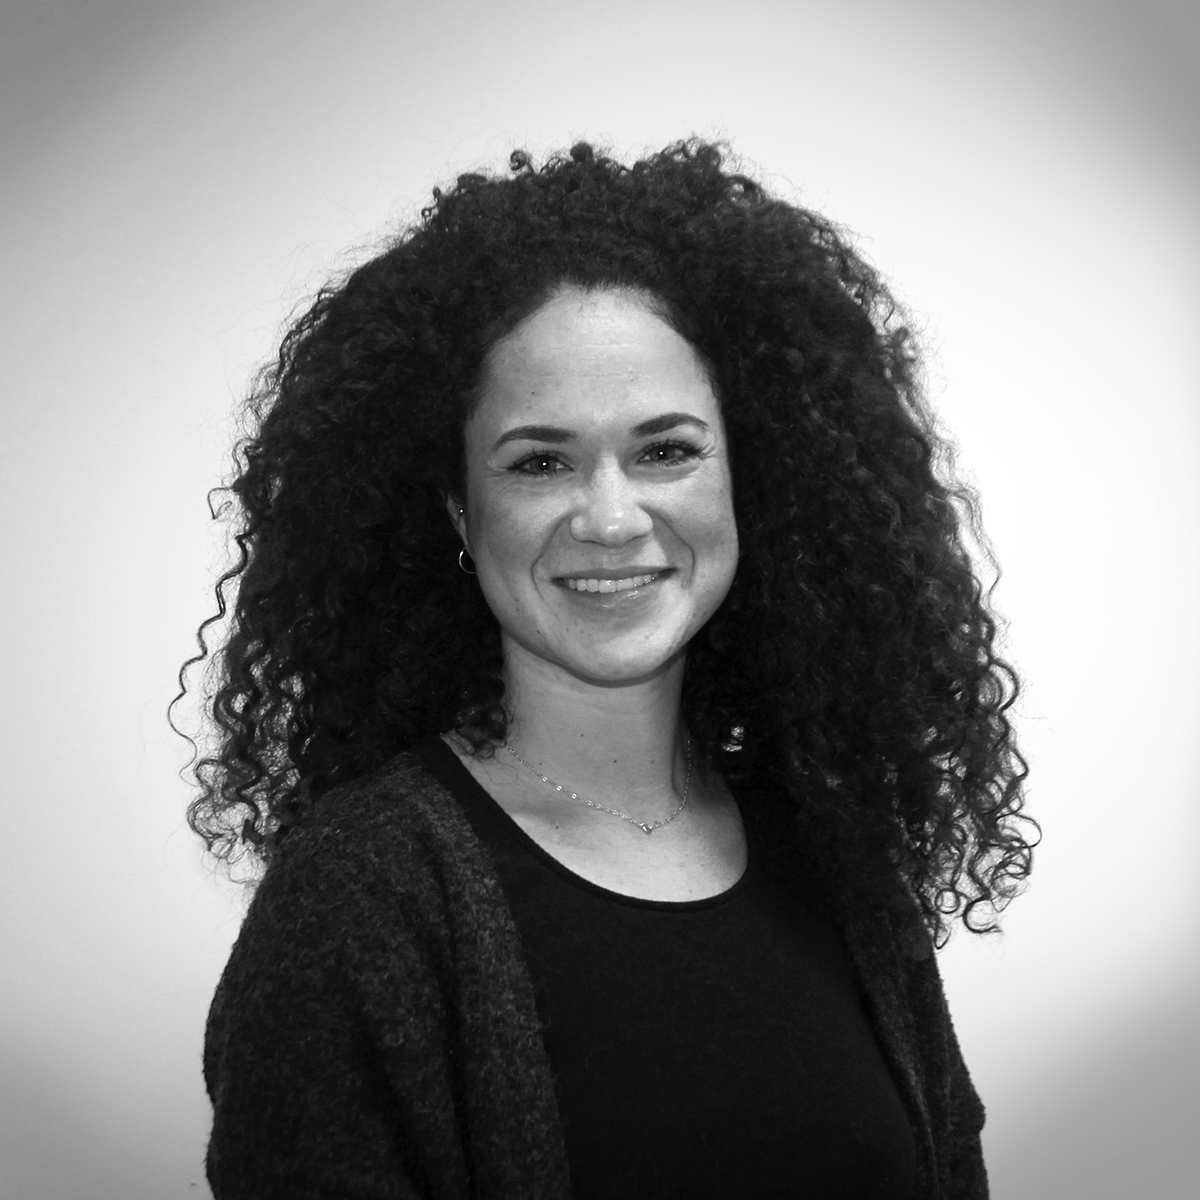 Nadine Arce Haanraadts